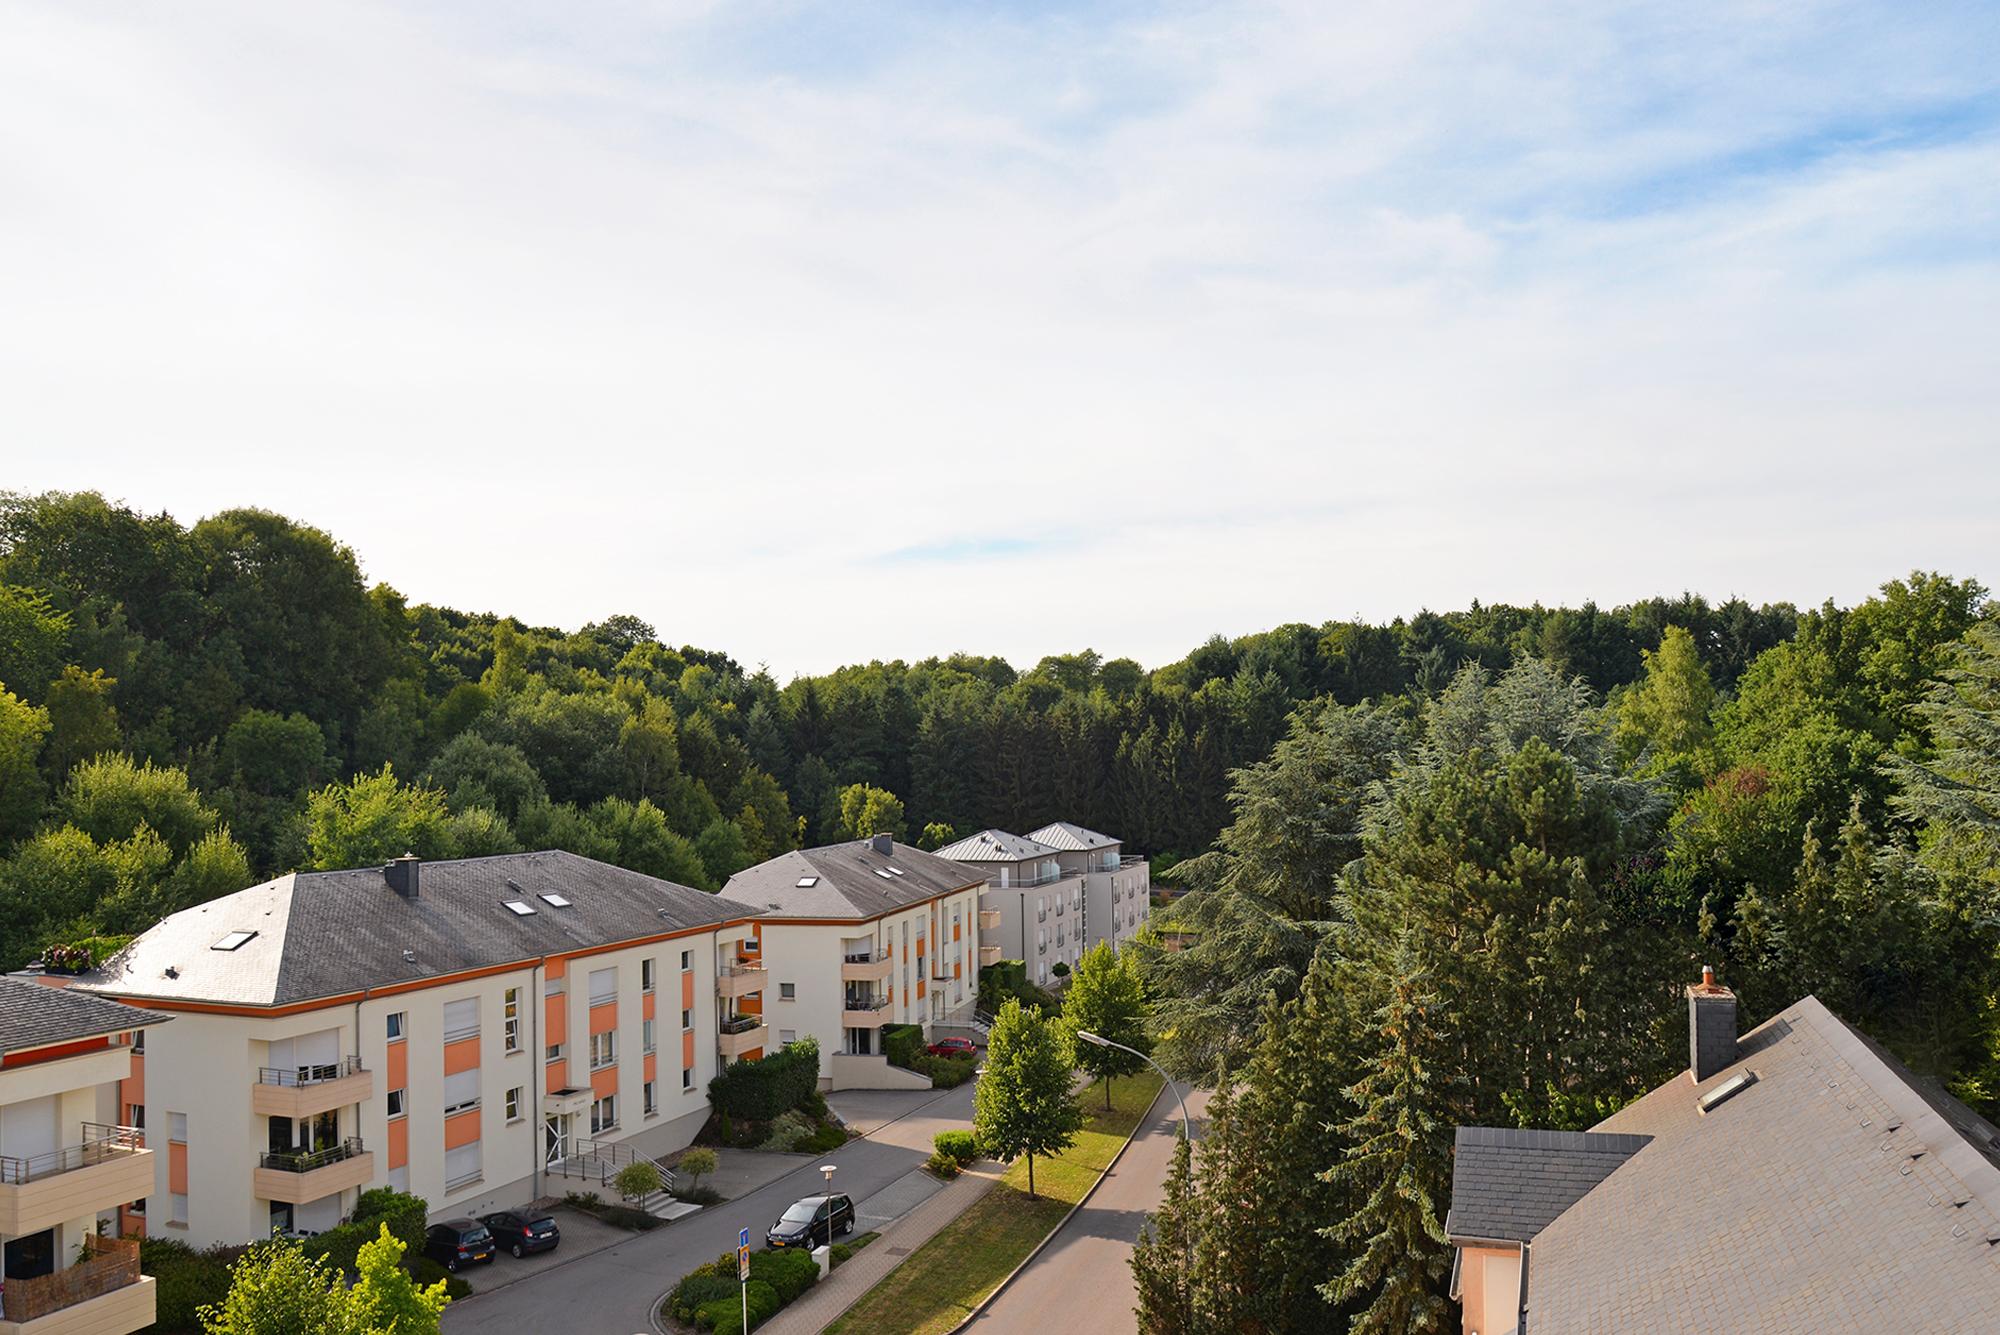 Single Family Home for Sale at Maison jumelée à Strassen 151 rue de Reckenthal Strassen, 2410 Luxembourg